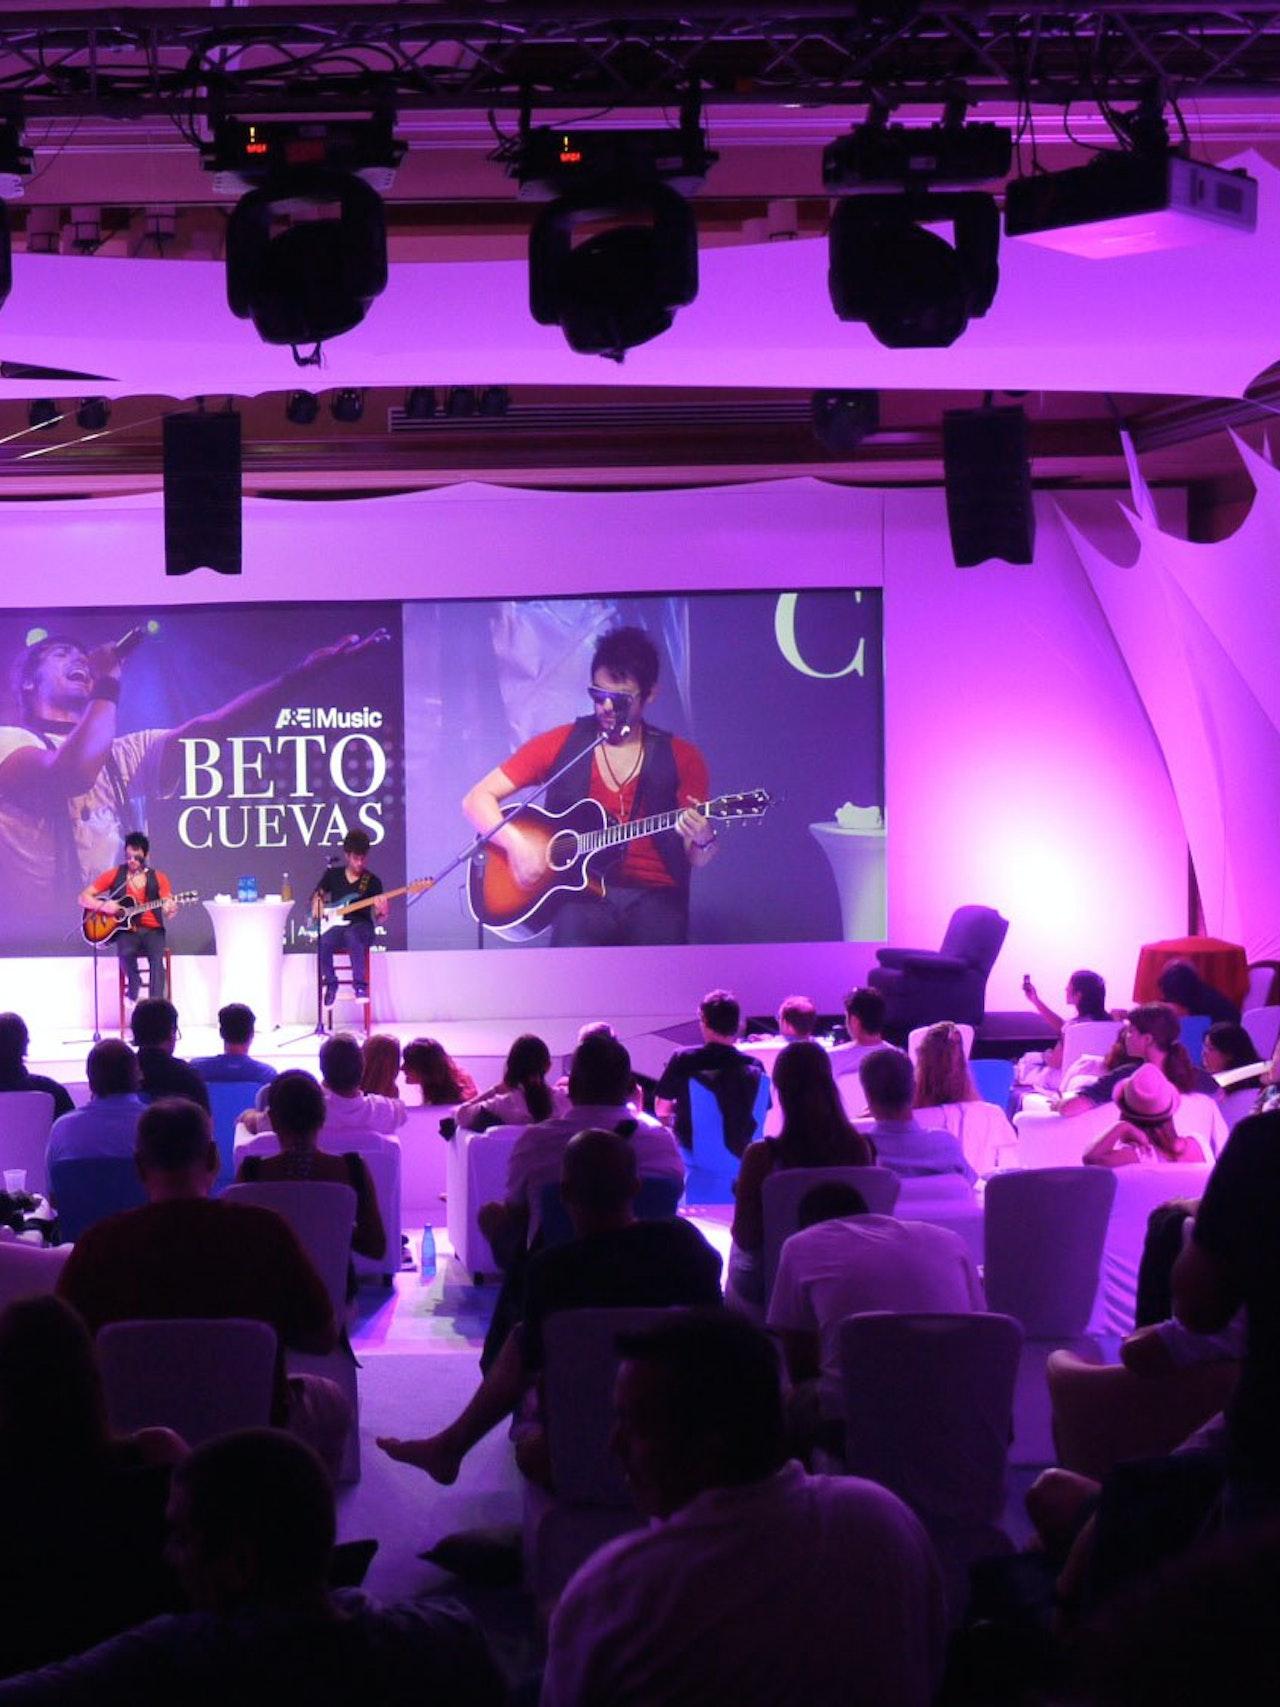 VC MEDIOS CURAÇAO UPFRONT EVENT